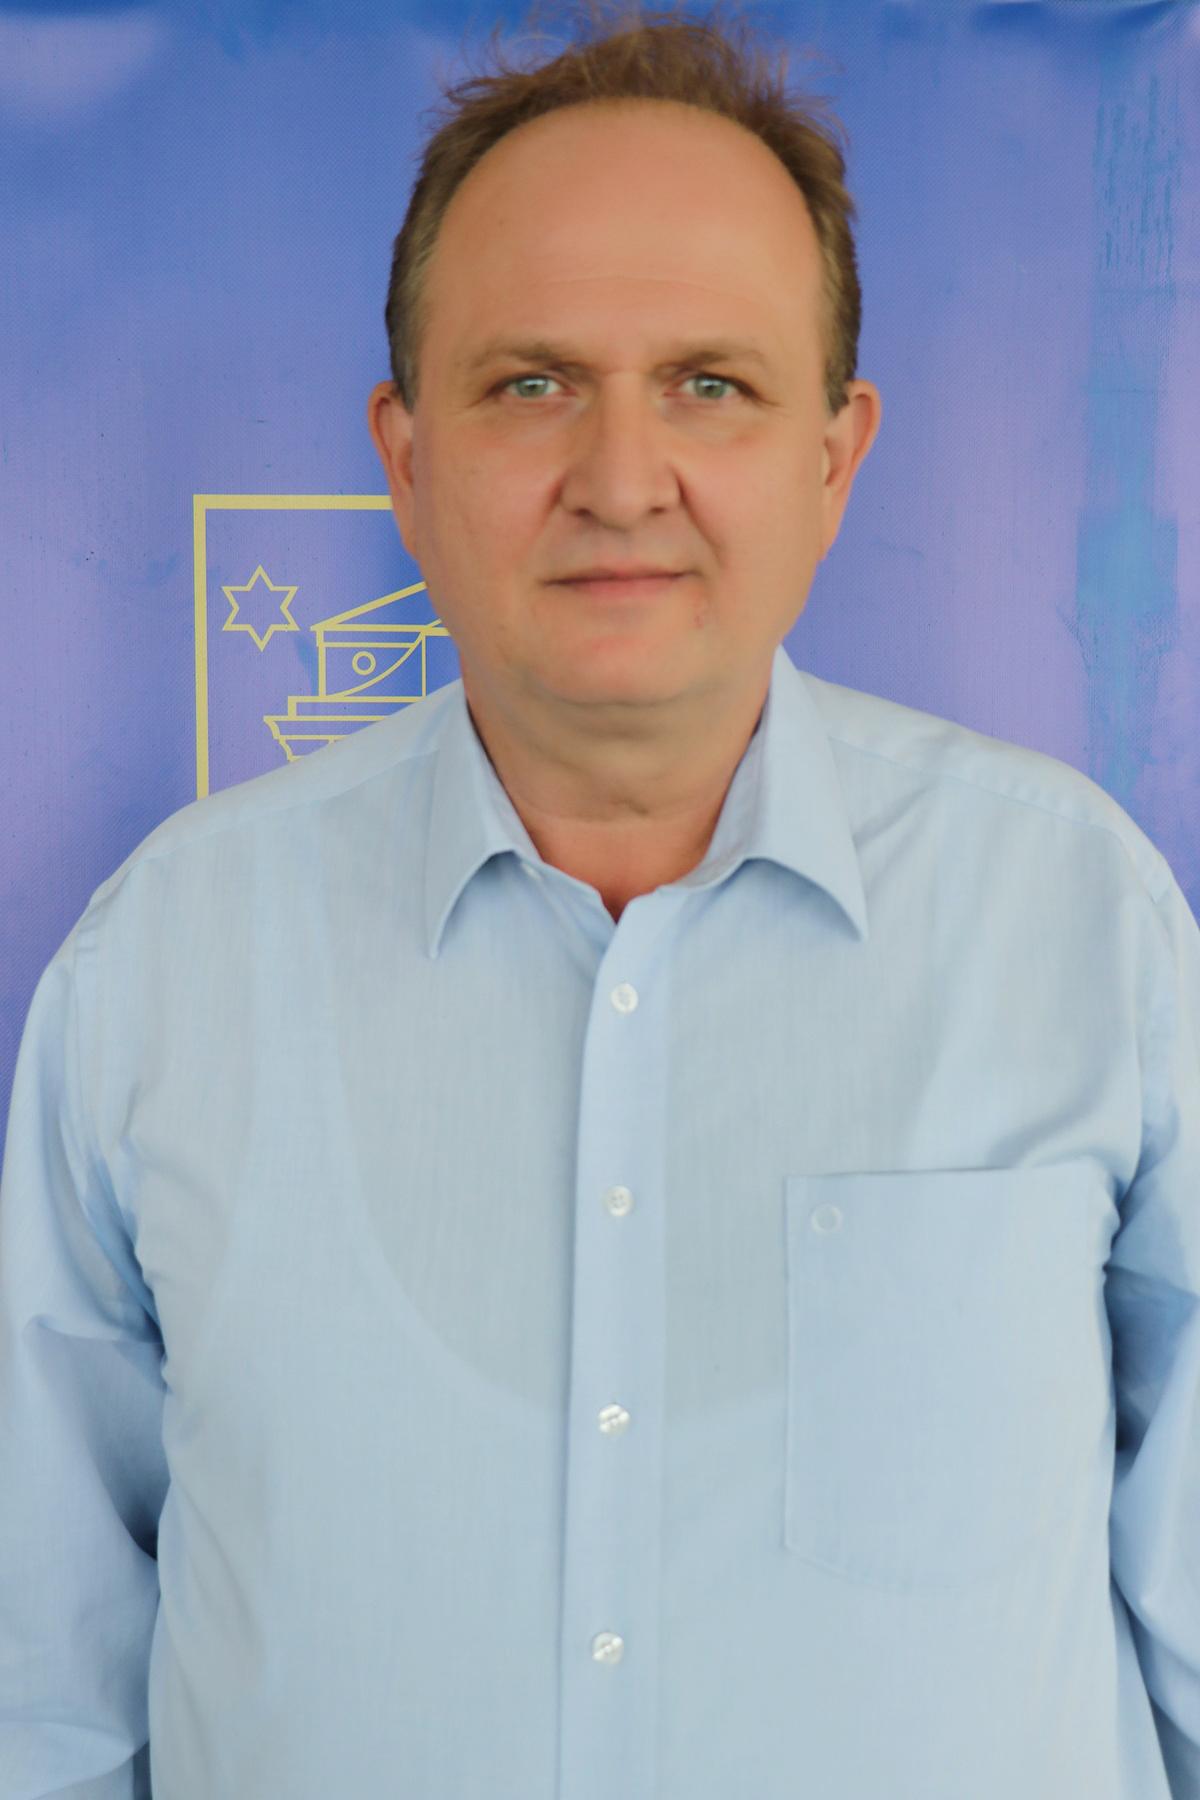 Tihomir Mihalj